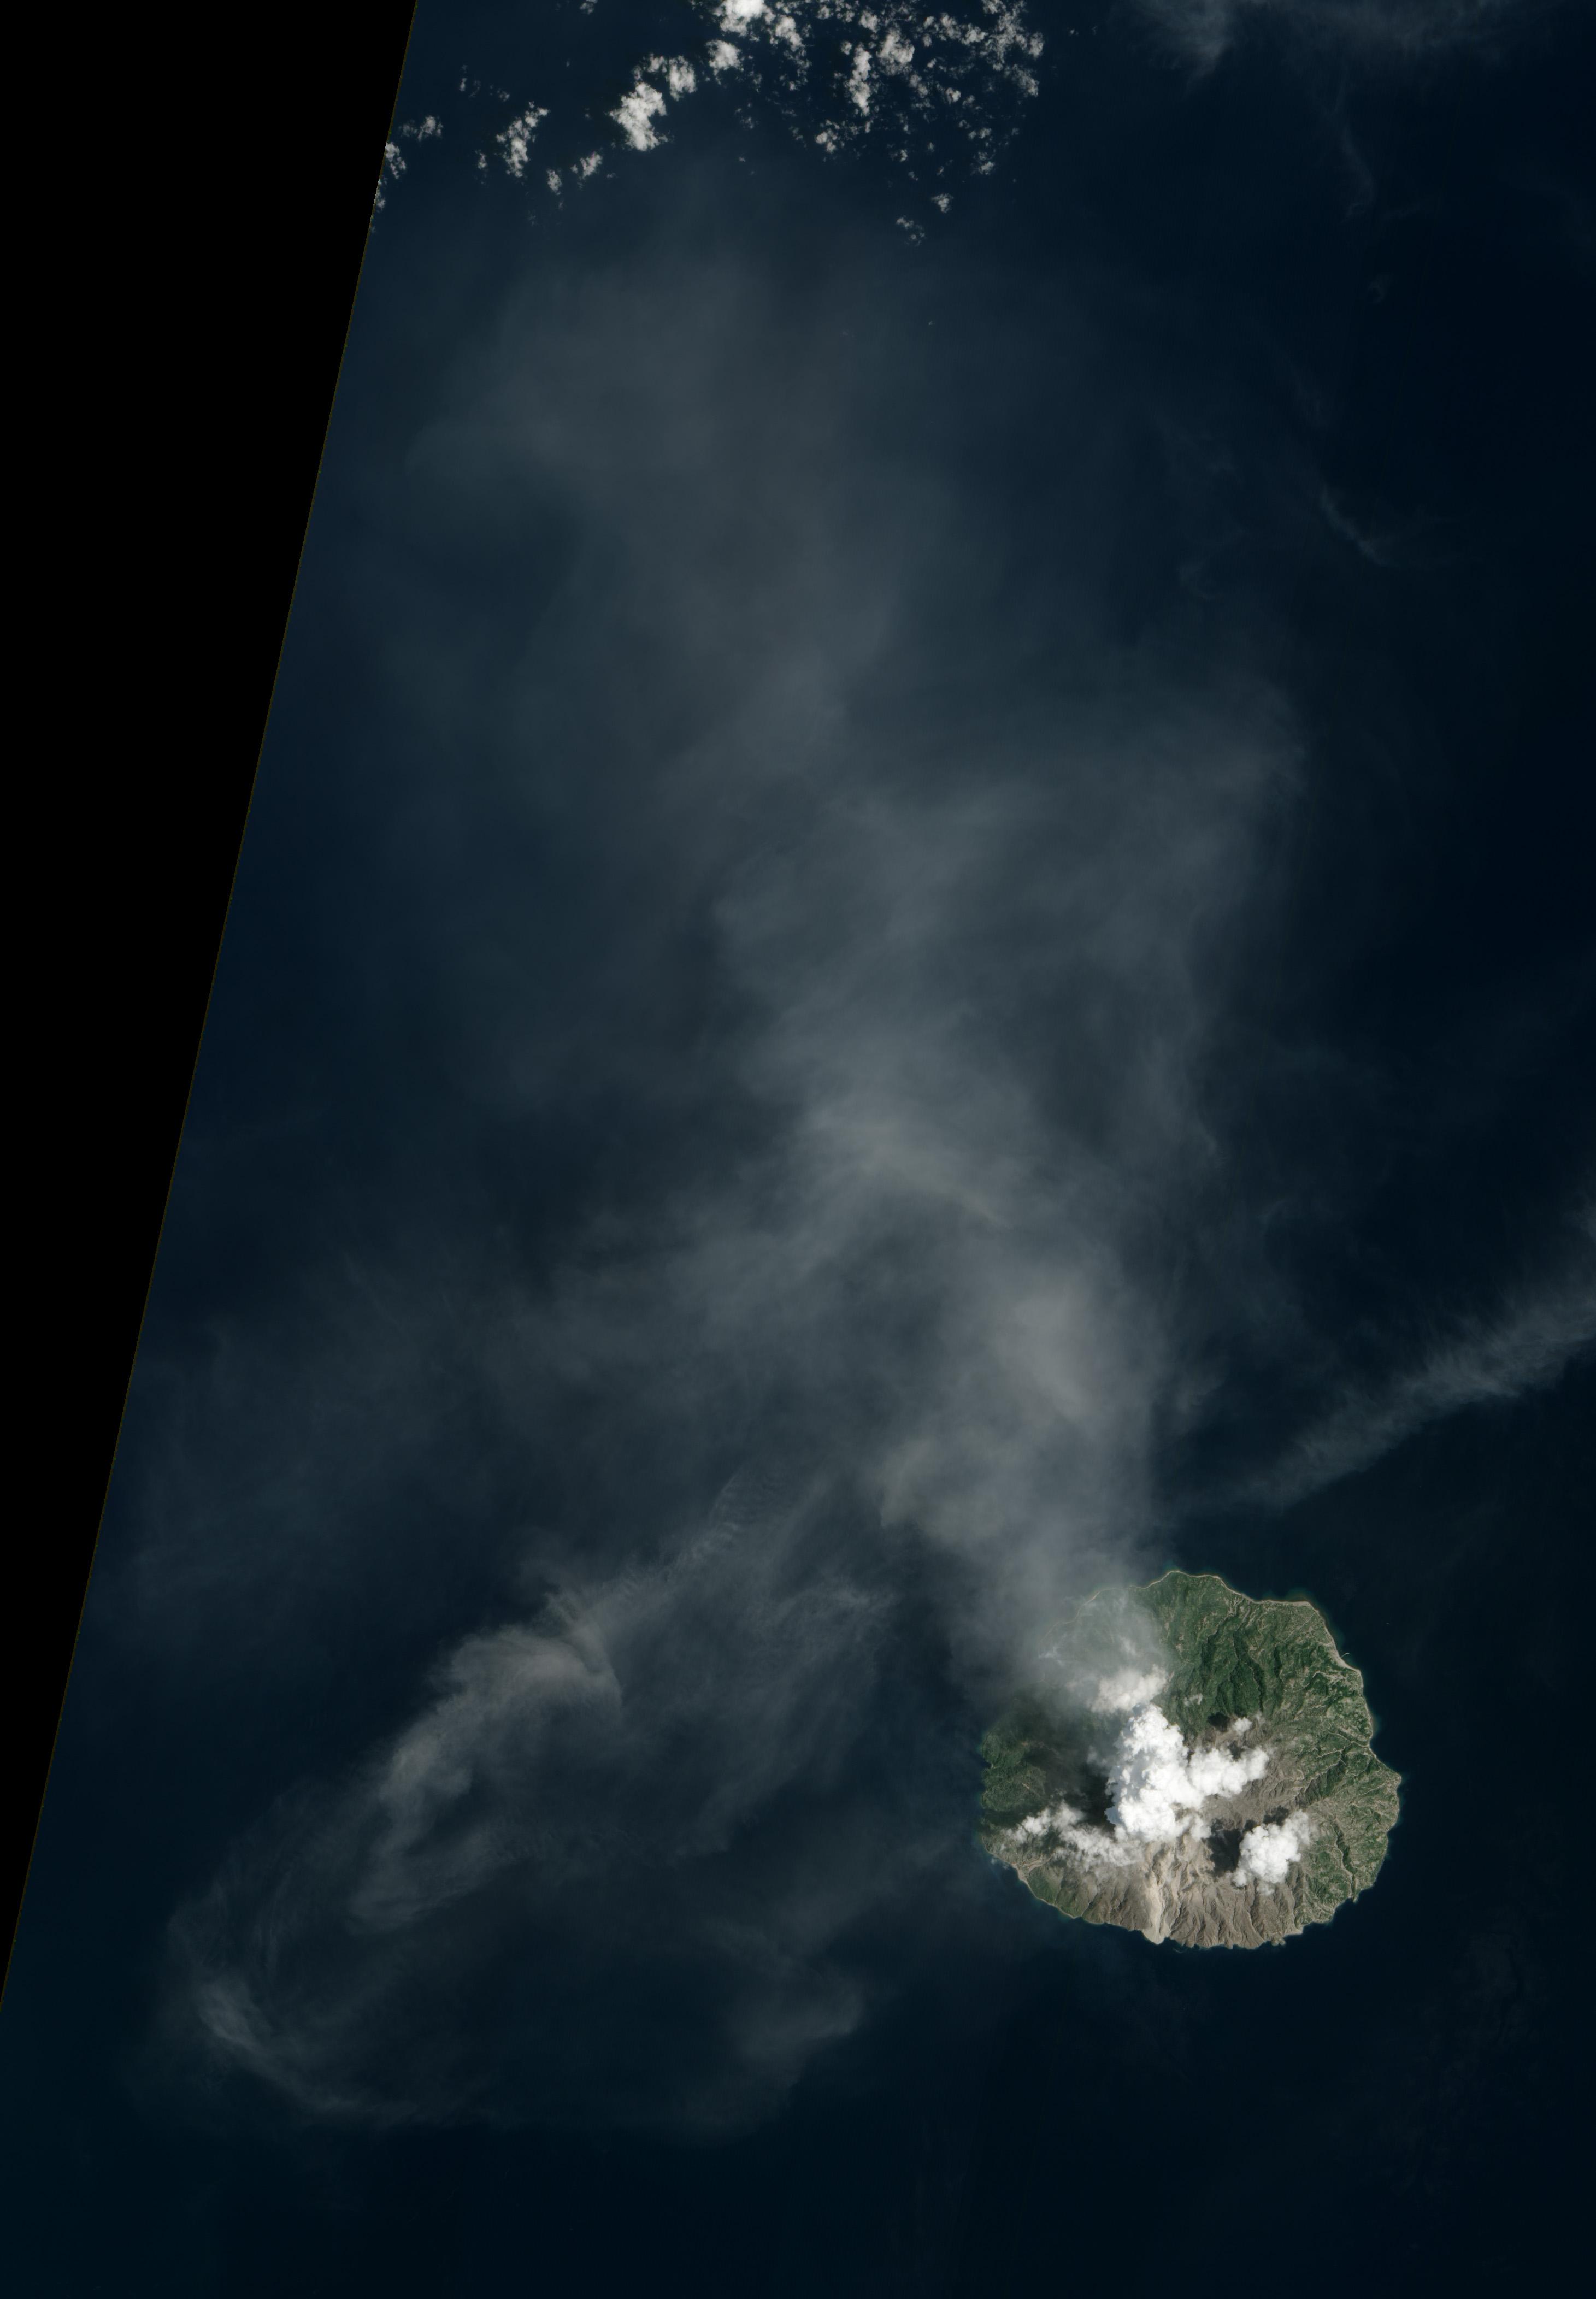 Die Insel Palue beim Vulkanausbruch im Februar 2013 aus dem All fotografiert